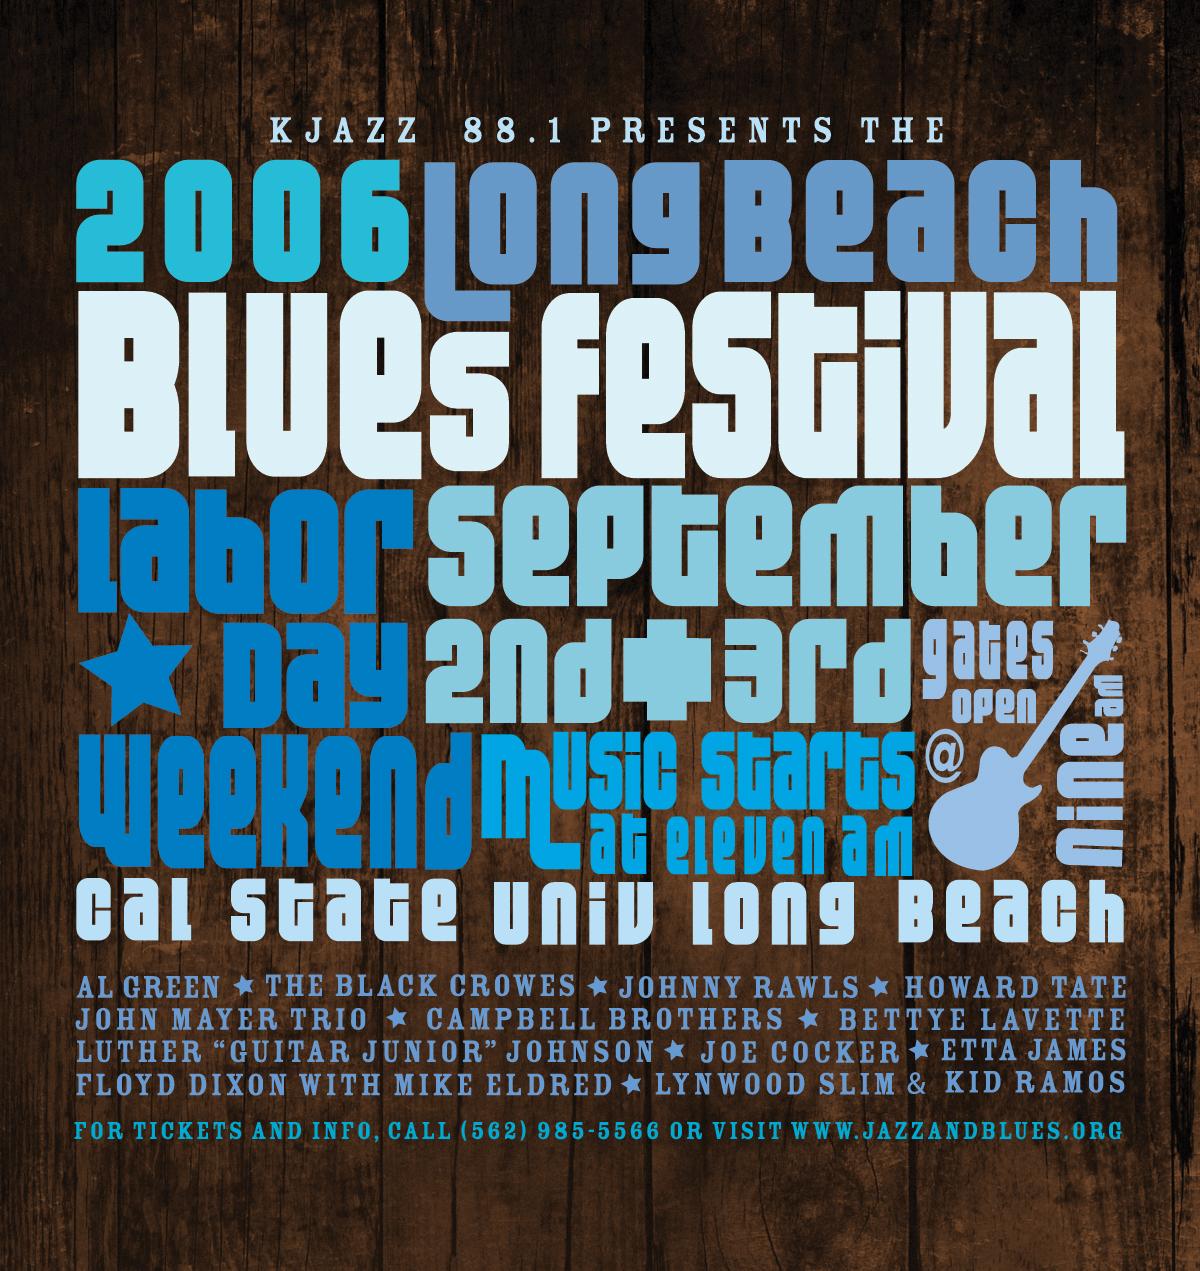 Long Beach Jazz Festival Poster - Simone Design + Develop